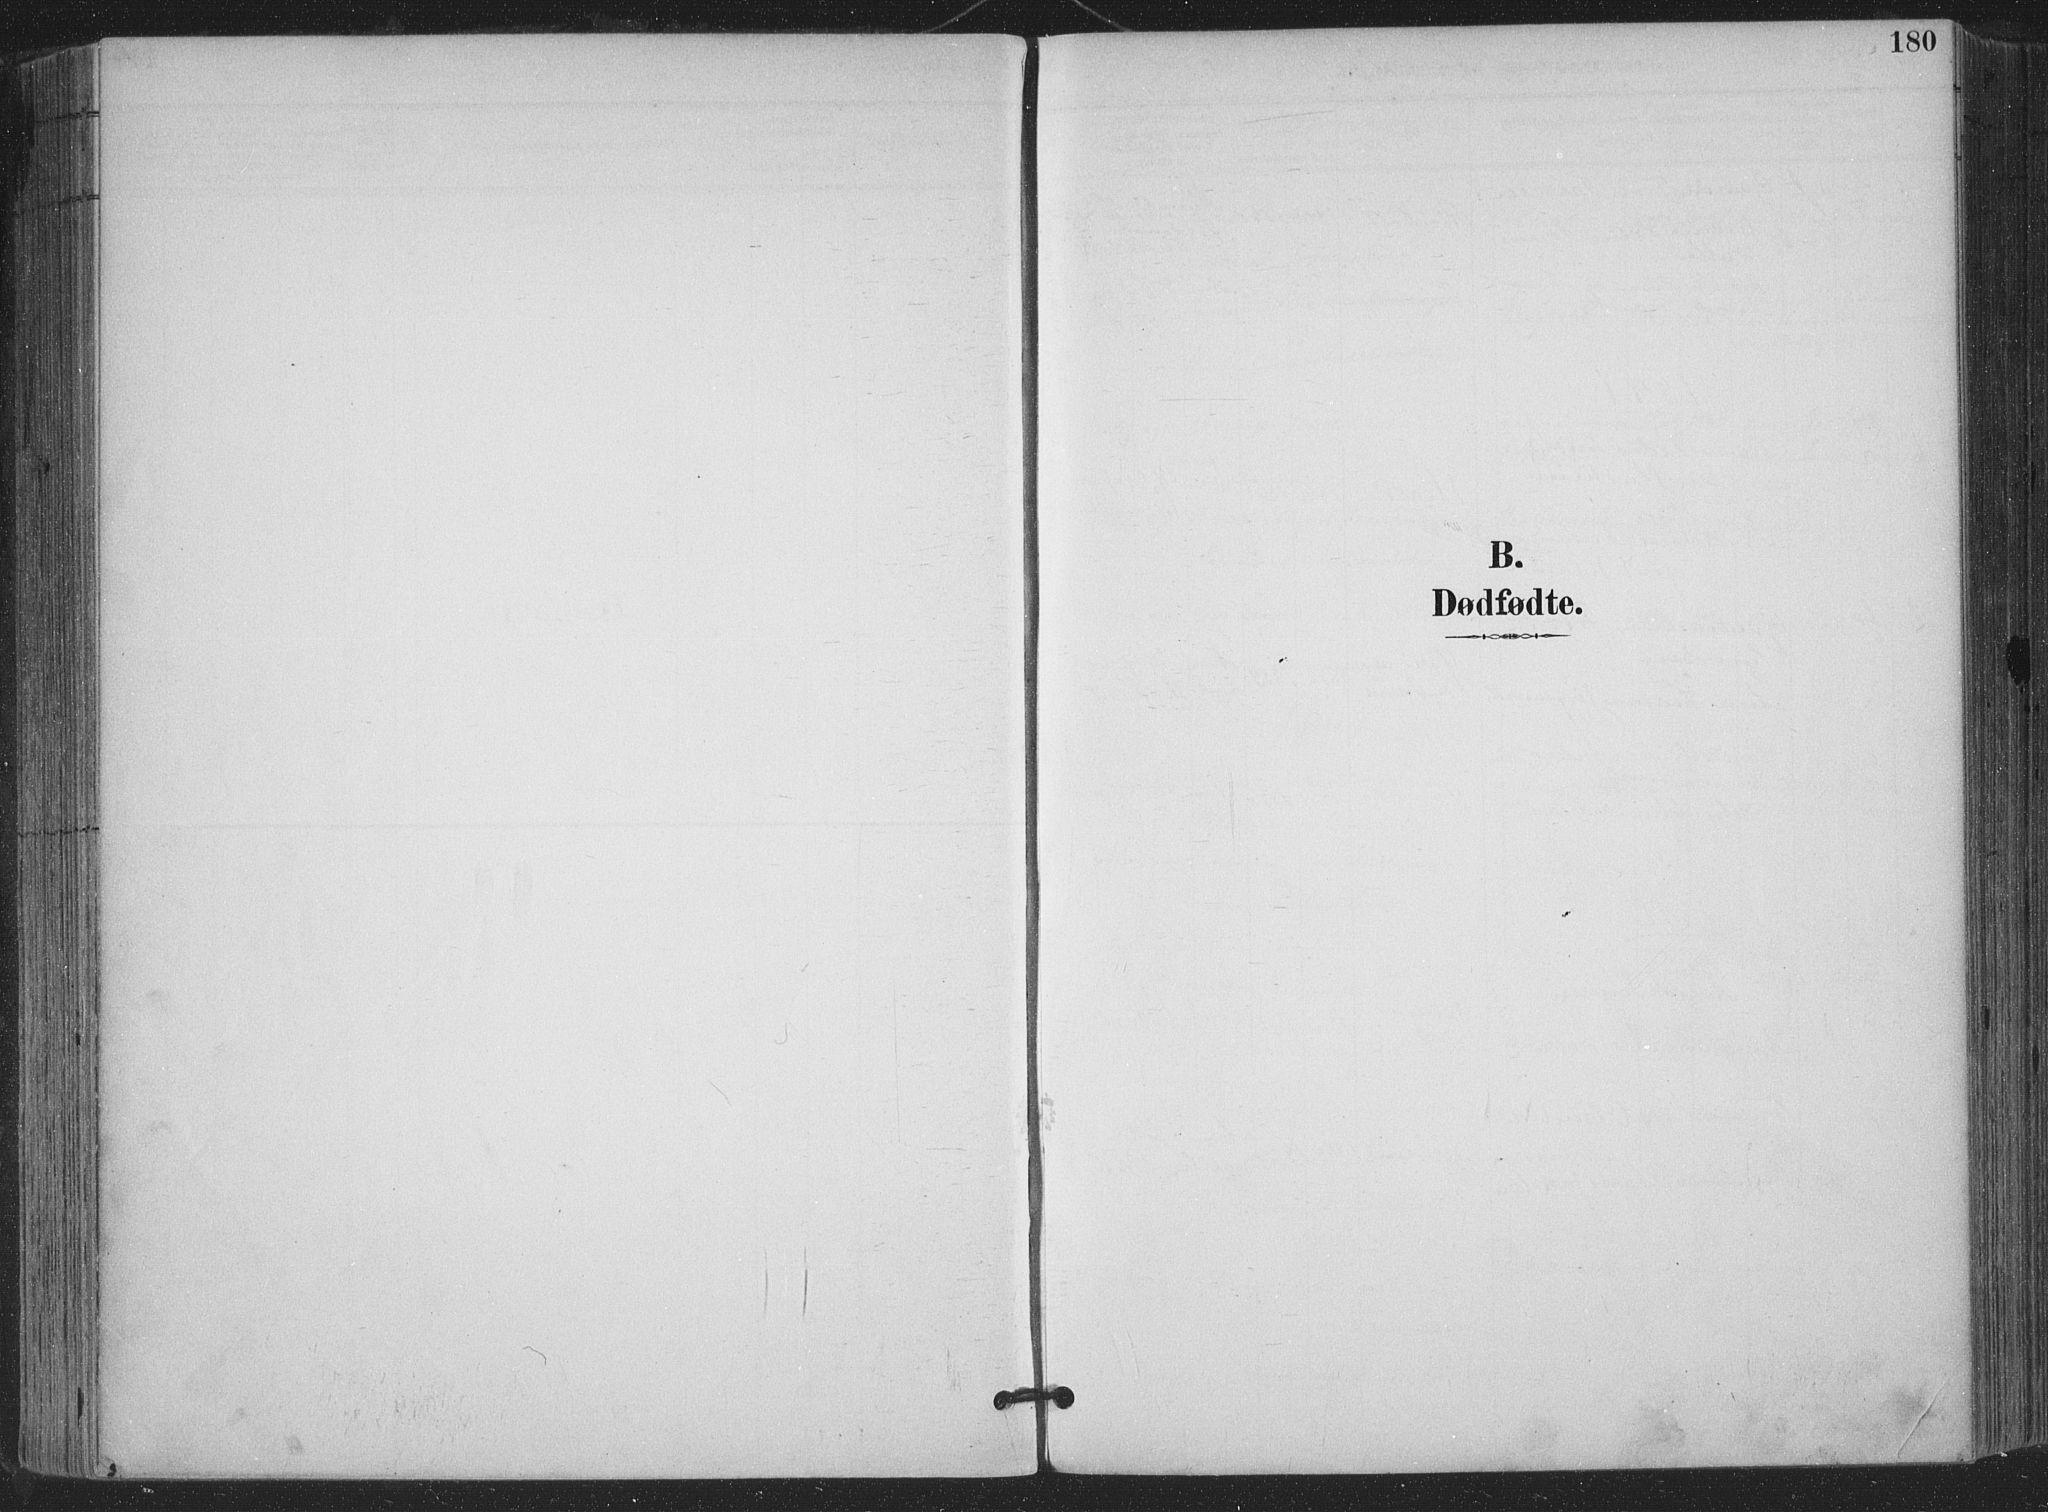 SAKO, Bamble kirkebøker, F/Fa/L0008: Ministerialbok nr. I 8, 1888-1900, s. 180